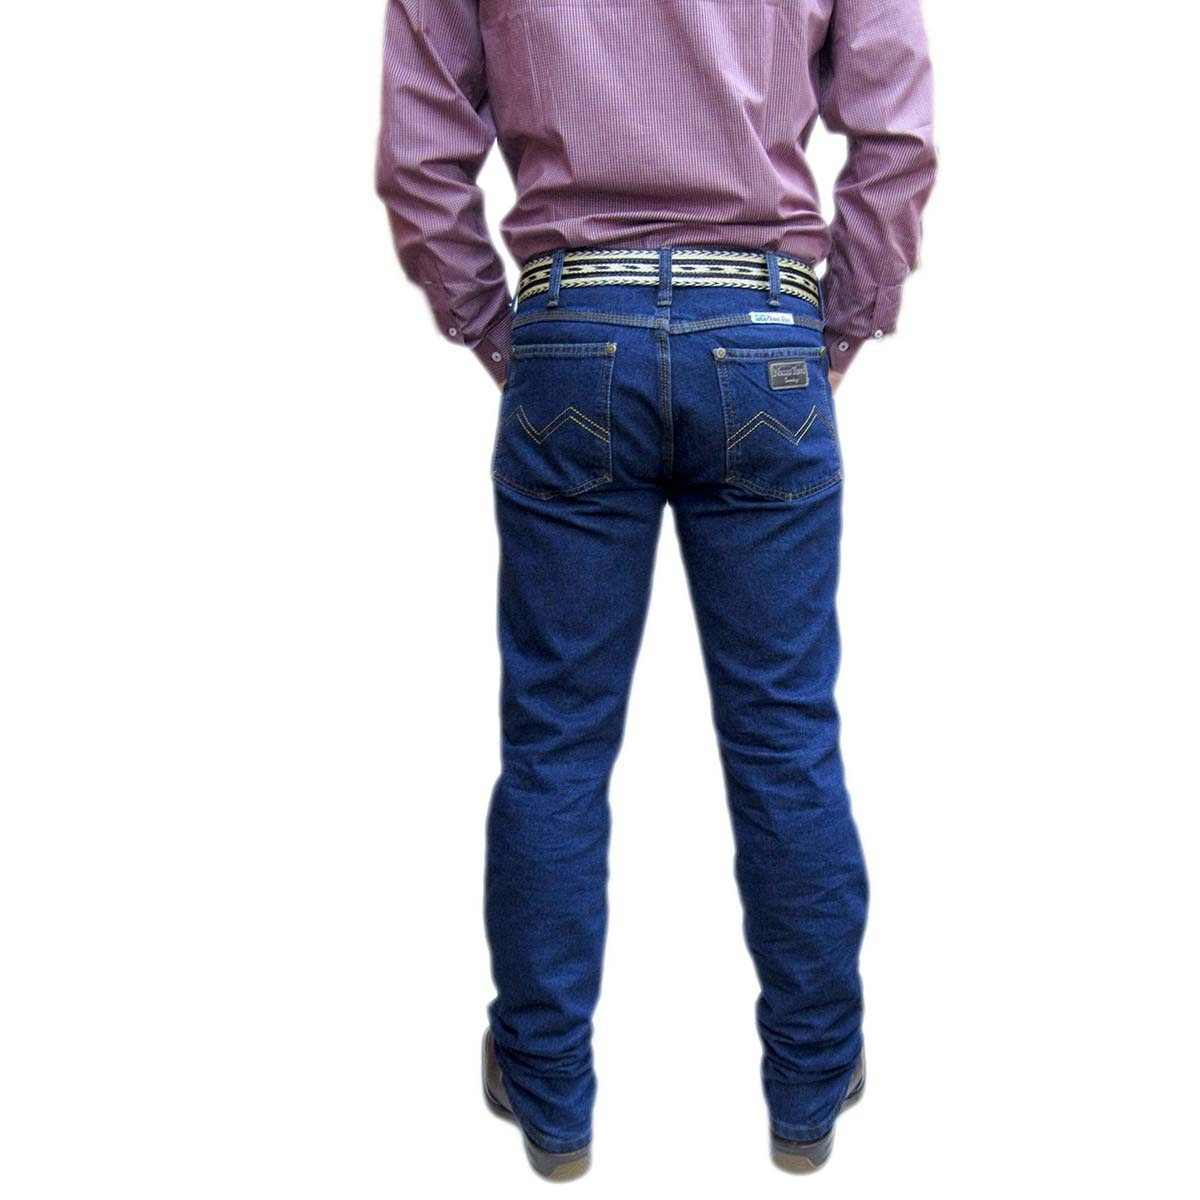 f249fa0b7b35f Carregando zoom... calça country jeans masculina blue jeans resistente -  9687